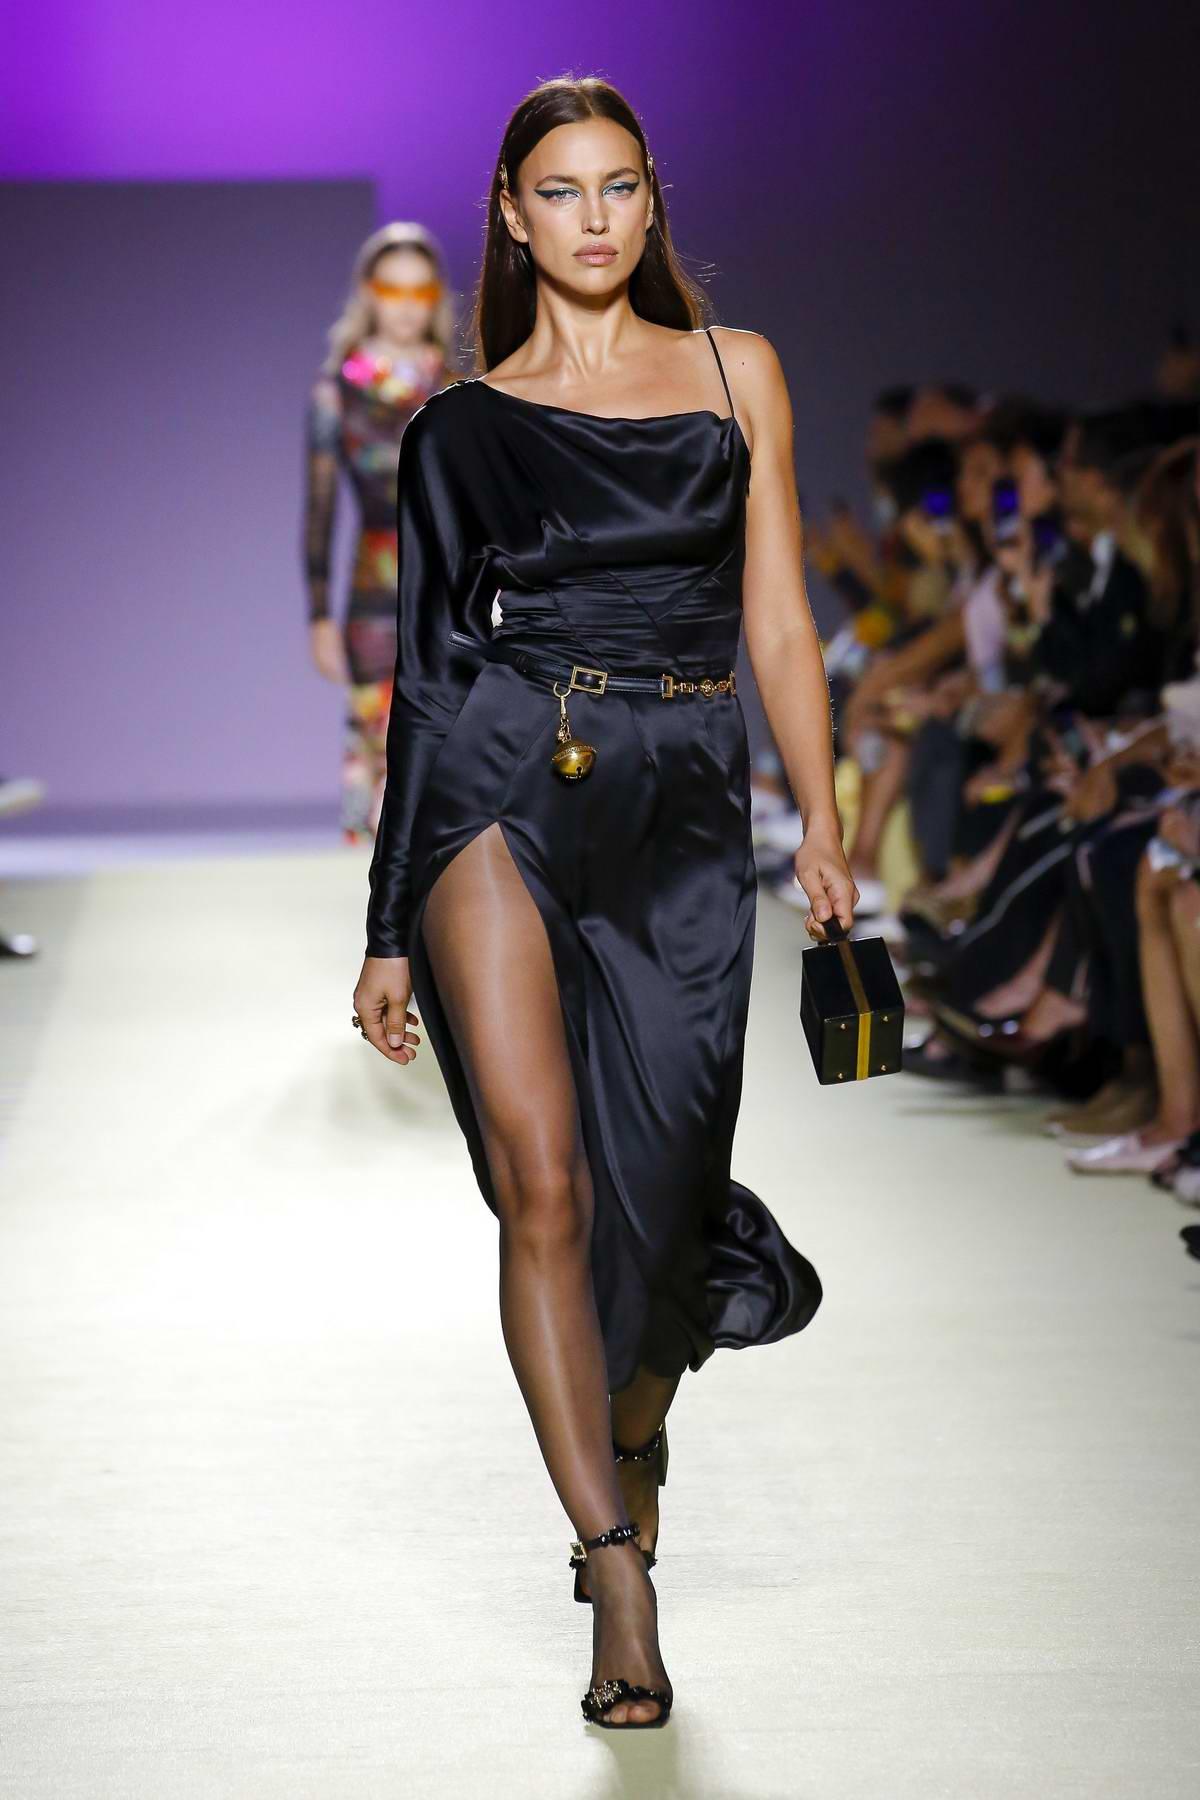 Irina Shayk walks the runway at Versace Fashion Show during Milan Fashion Week, Spring/Summer 2019 in Milan, Italy